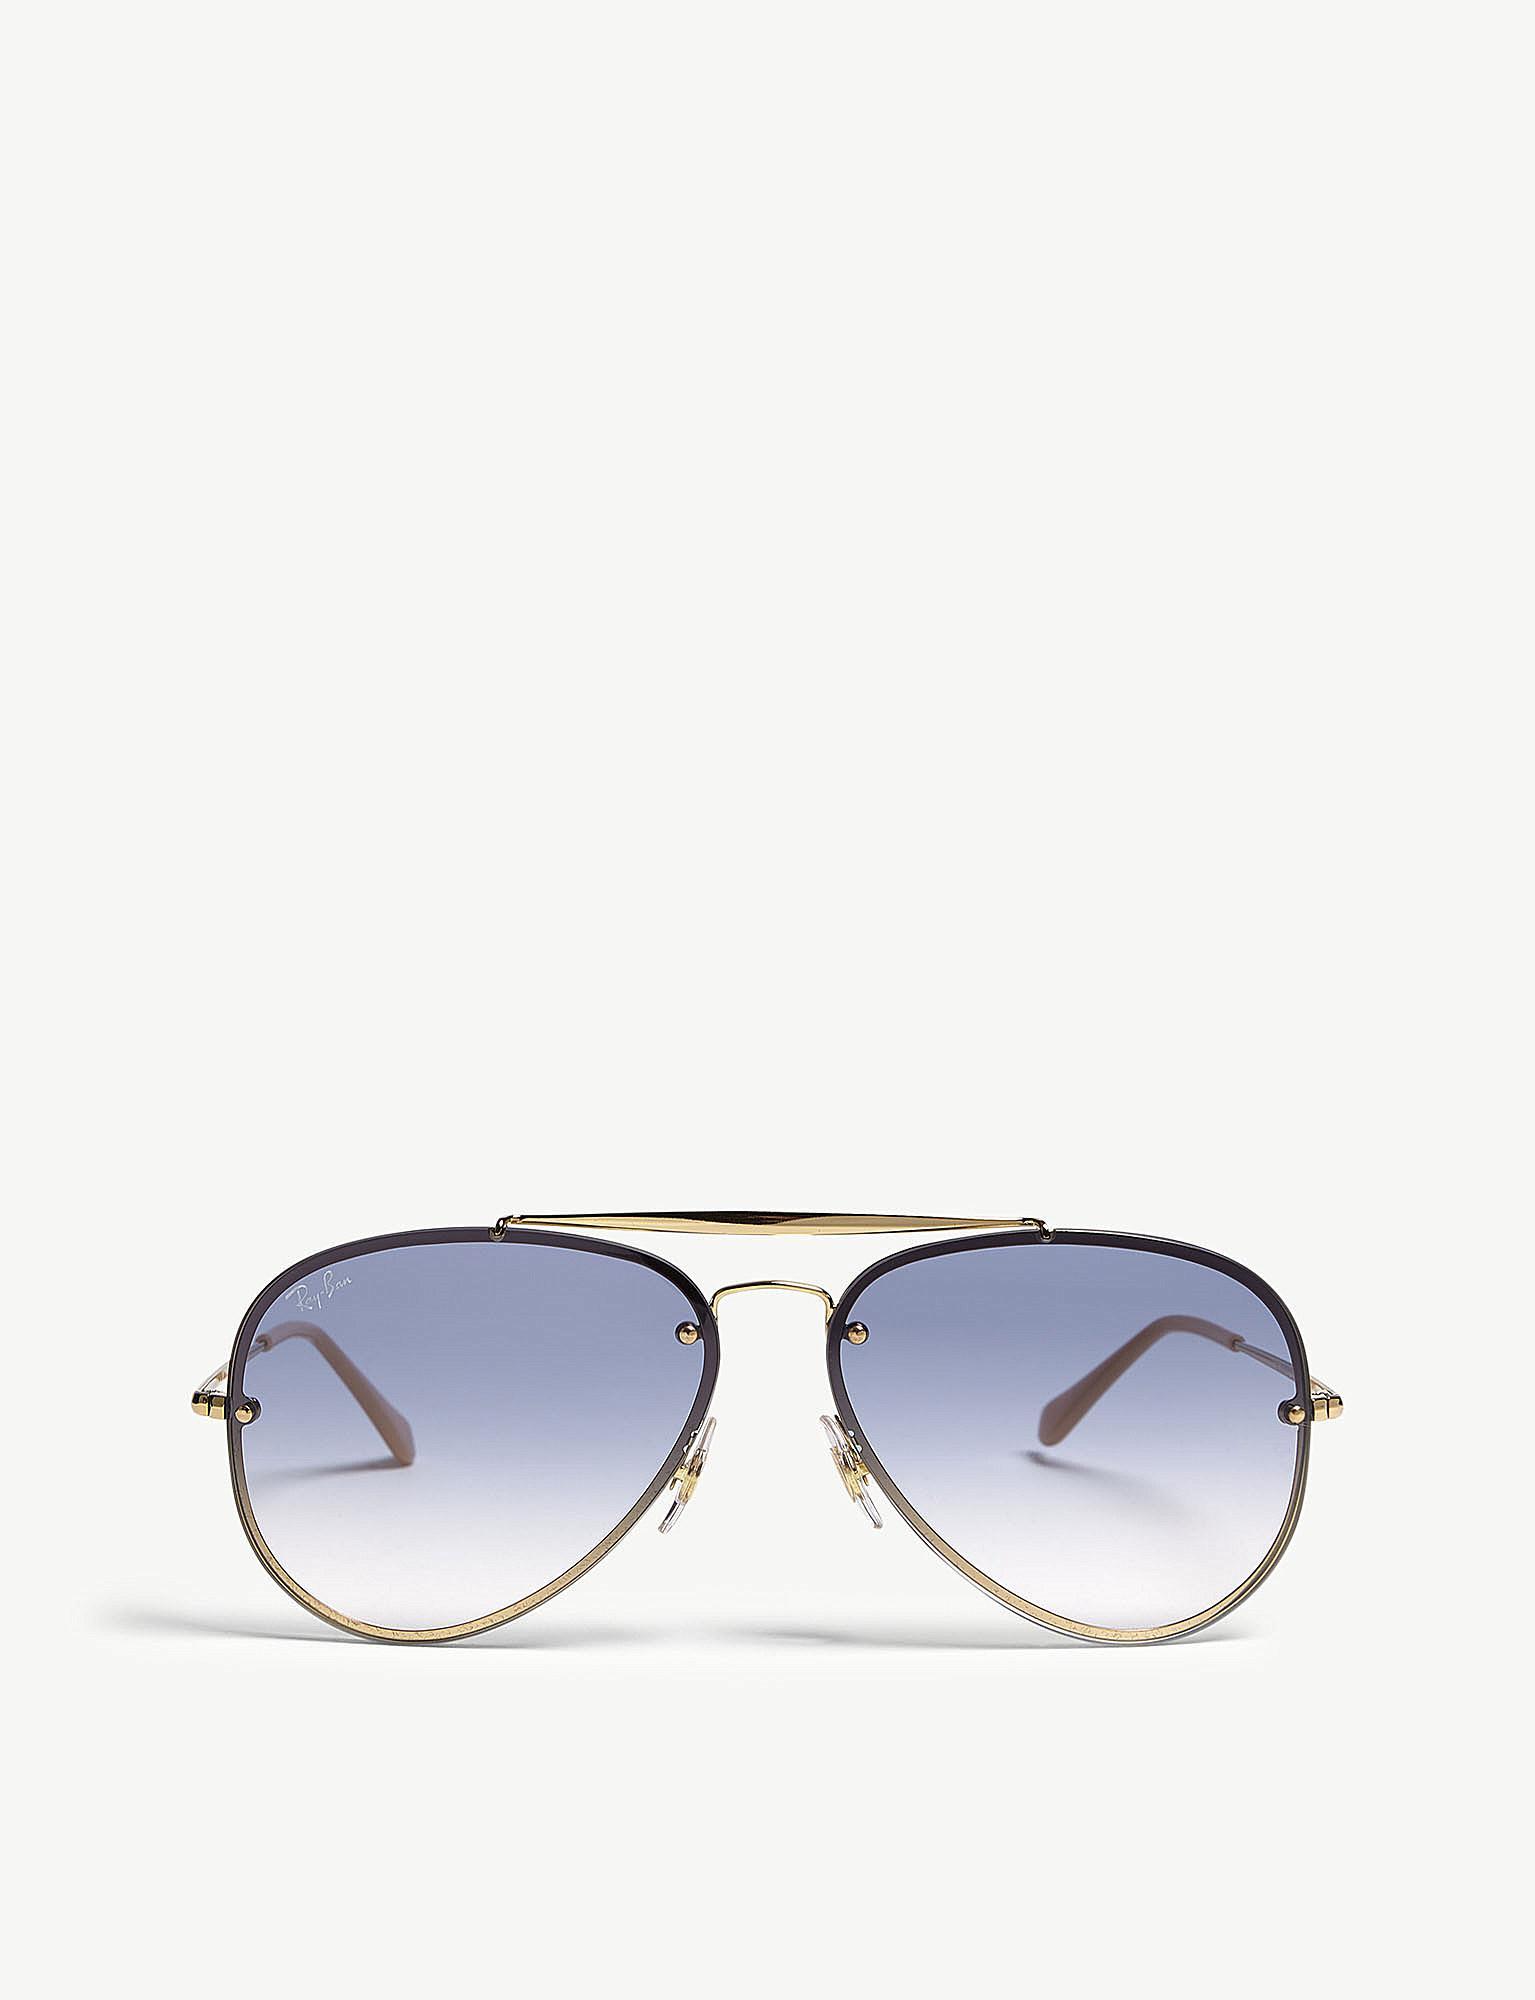 ray ban blade aviator sunglasses in metallic lyst Ray-Ban Aviator RB3044 ray ban women s metallic blade aviator sunglasses